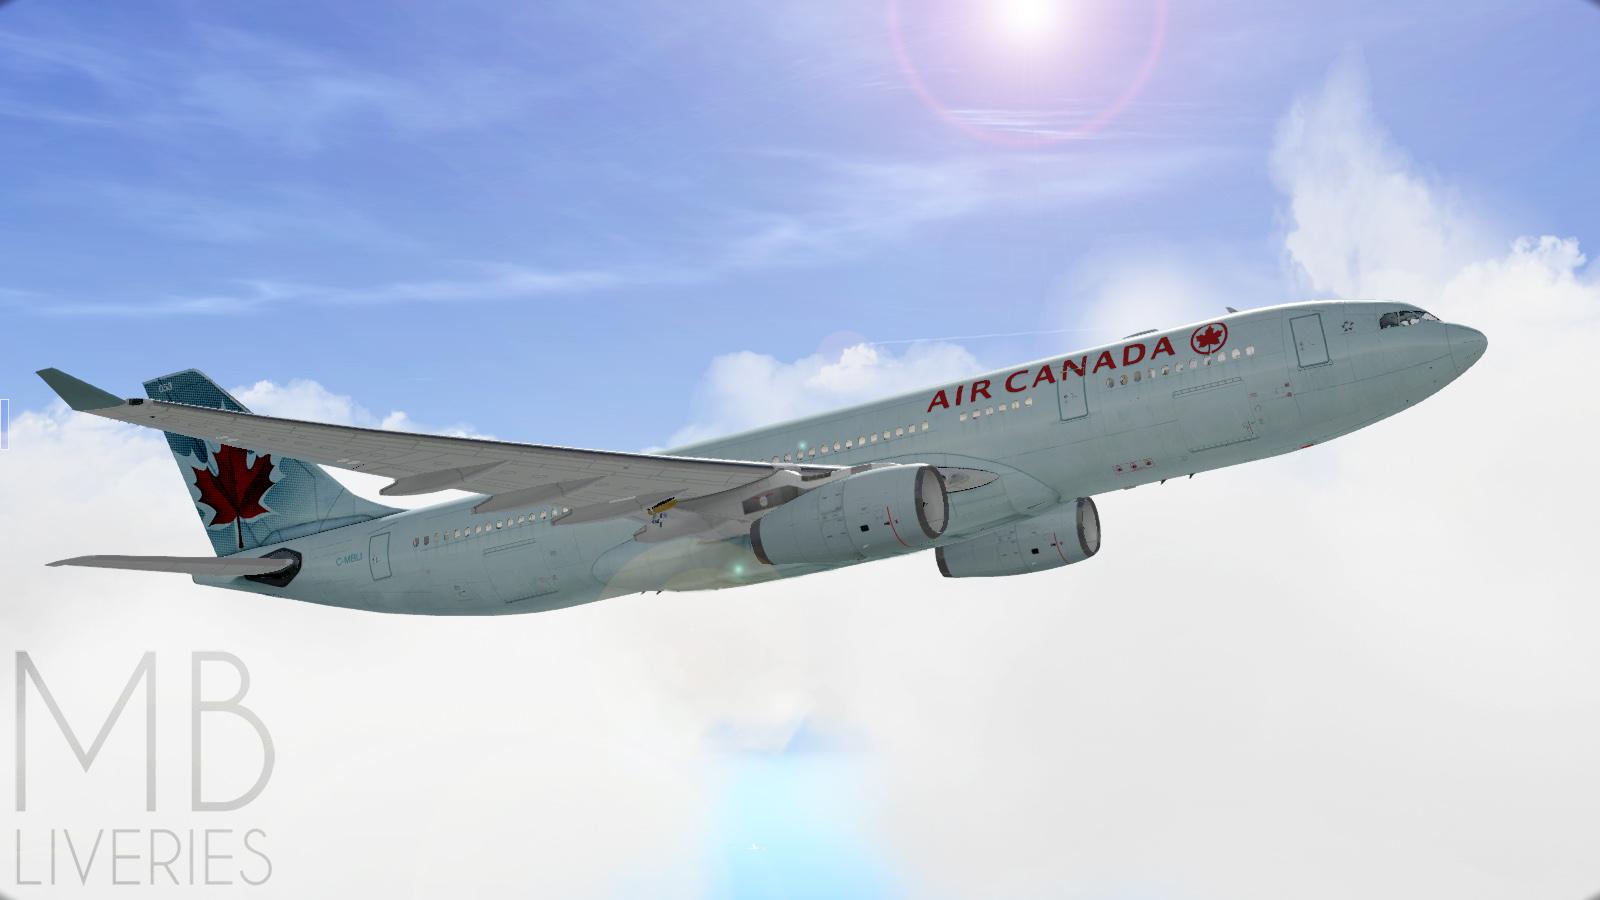 Air Canada - Airbus A330-200 JarDesign - Aircraft Skins - Liveries